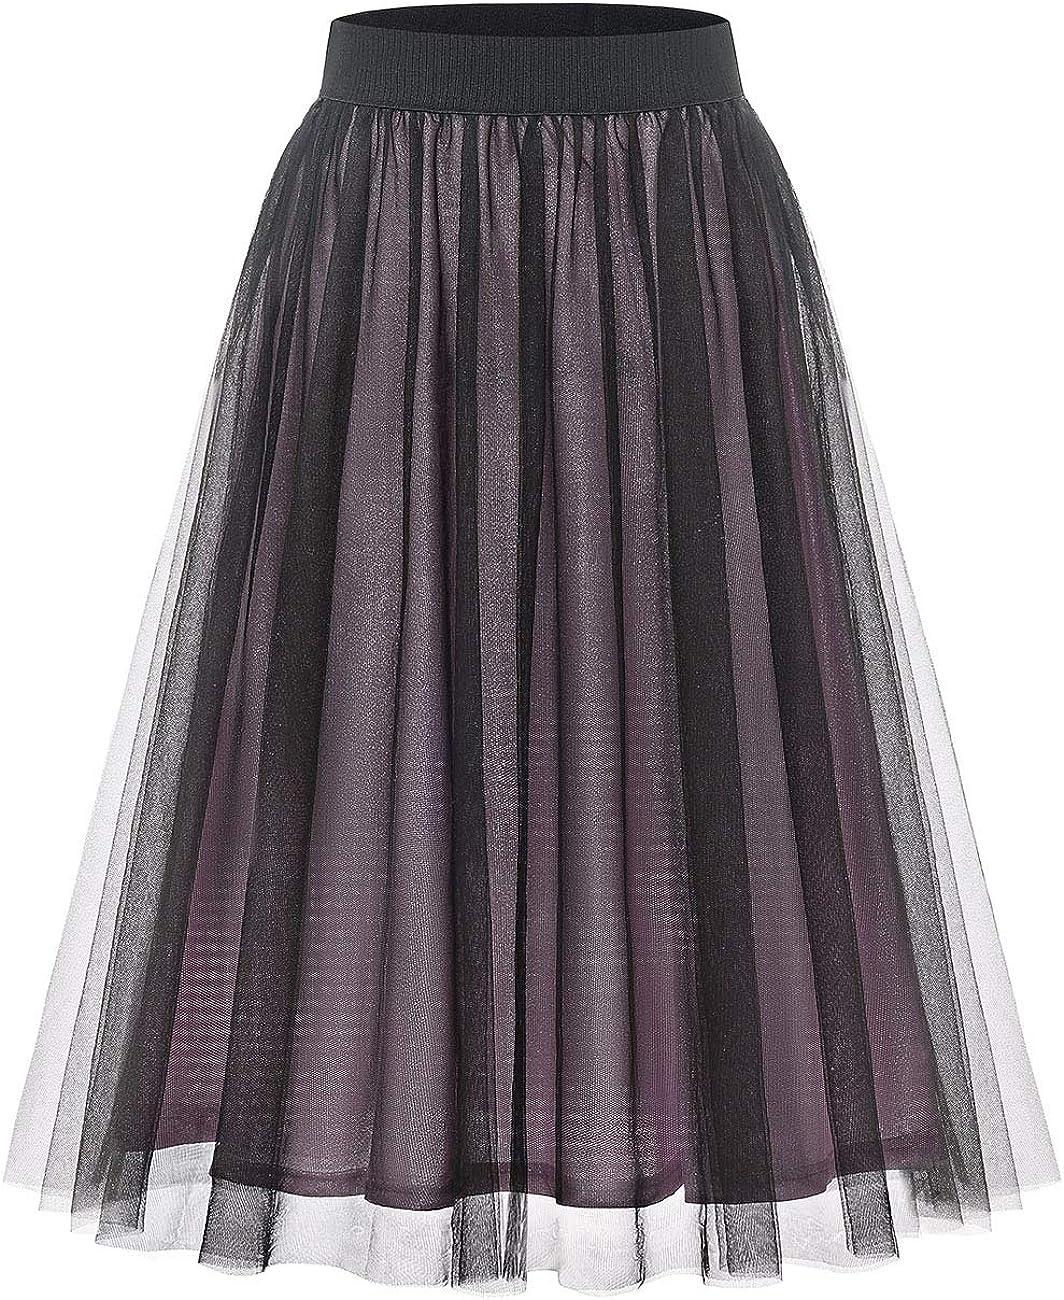 Bridesmay Women's Shinny 2-Layered Tulle Skirt Knee Length Evening Christmas Party Petticoat Tutu Skirt